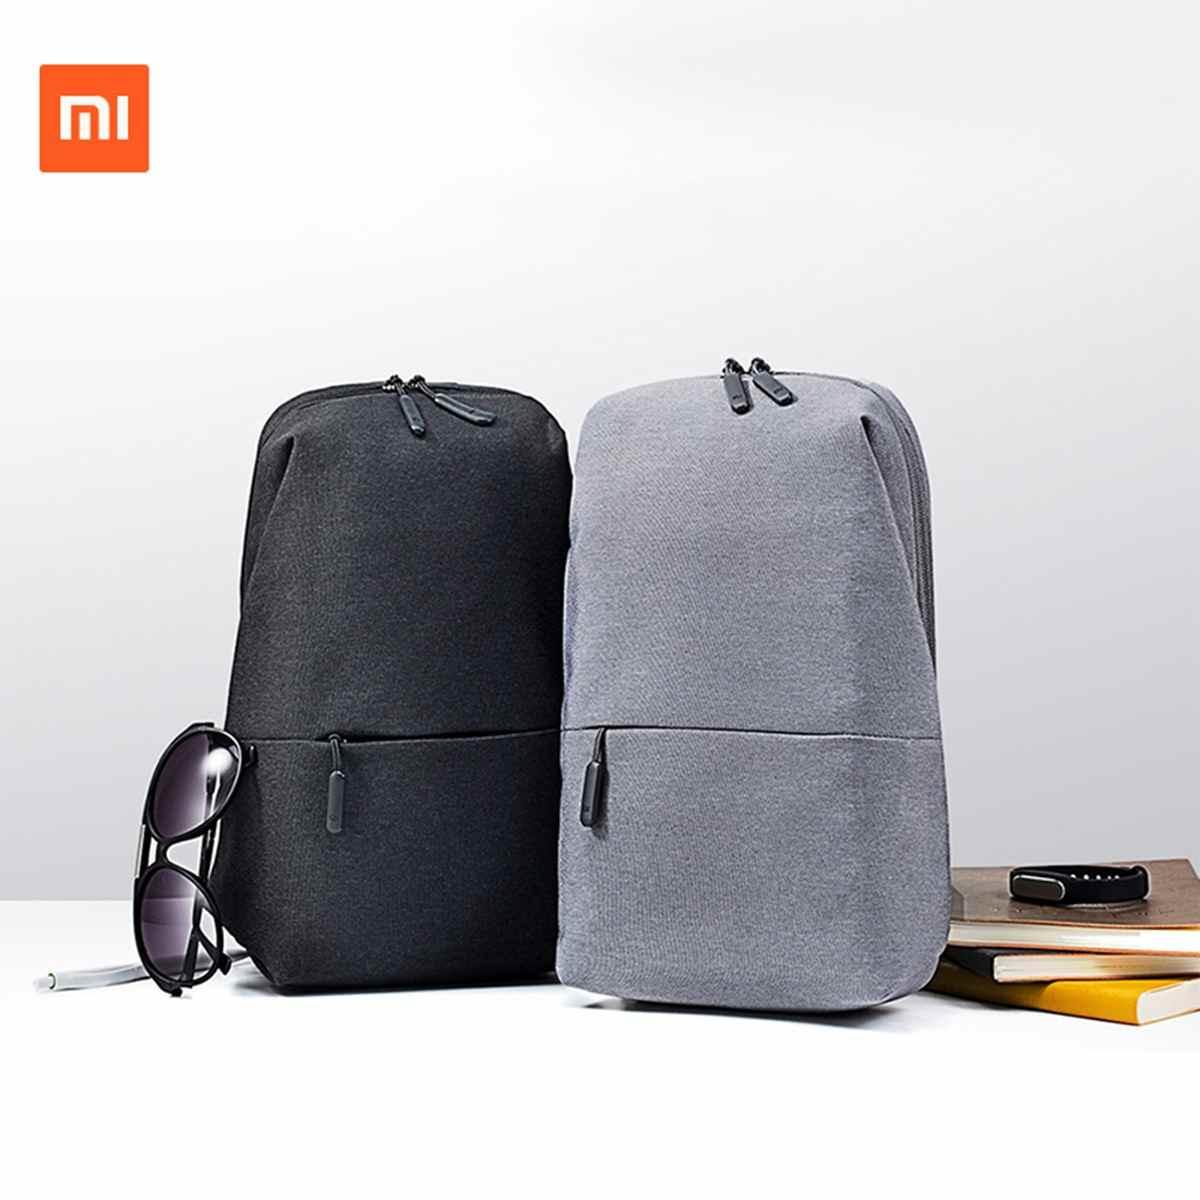 100% Xiaomi Mi Backpack Bag Urban Leisure Sports Chest Pack For Men Women Shoulder Bags Unisex Rucksack Laptop Travle Bags